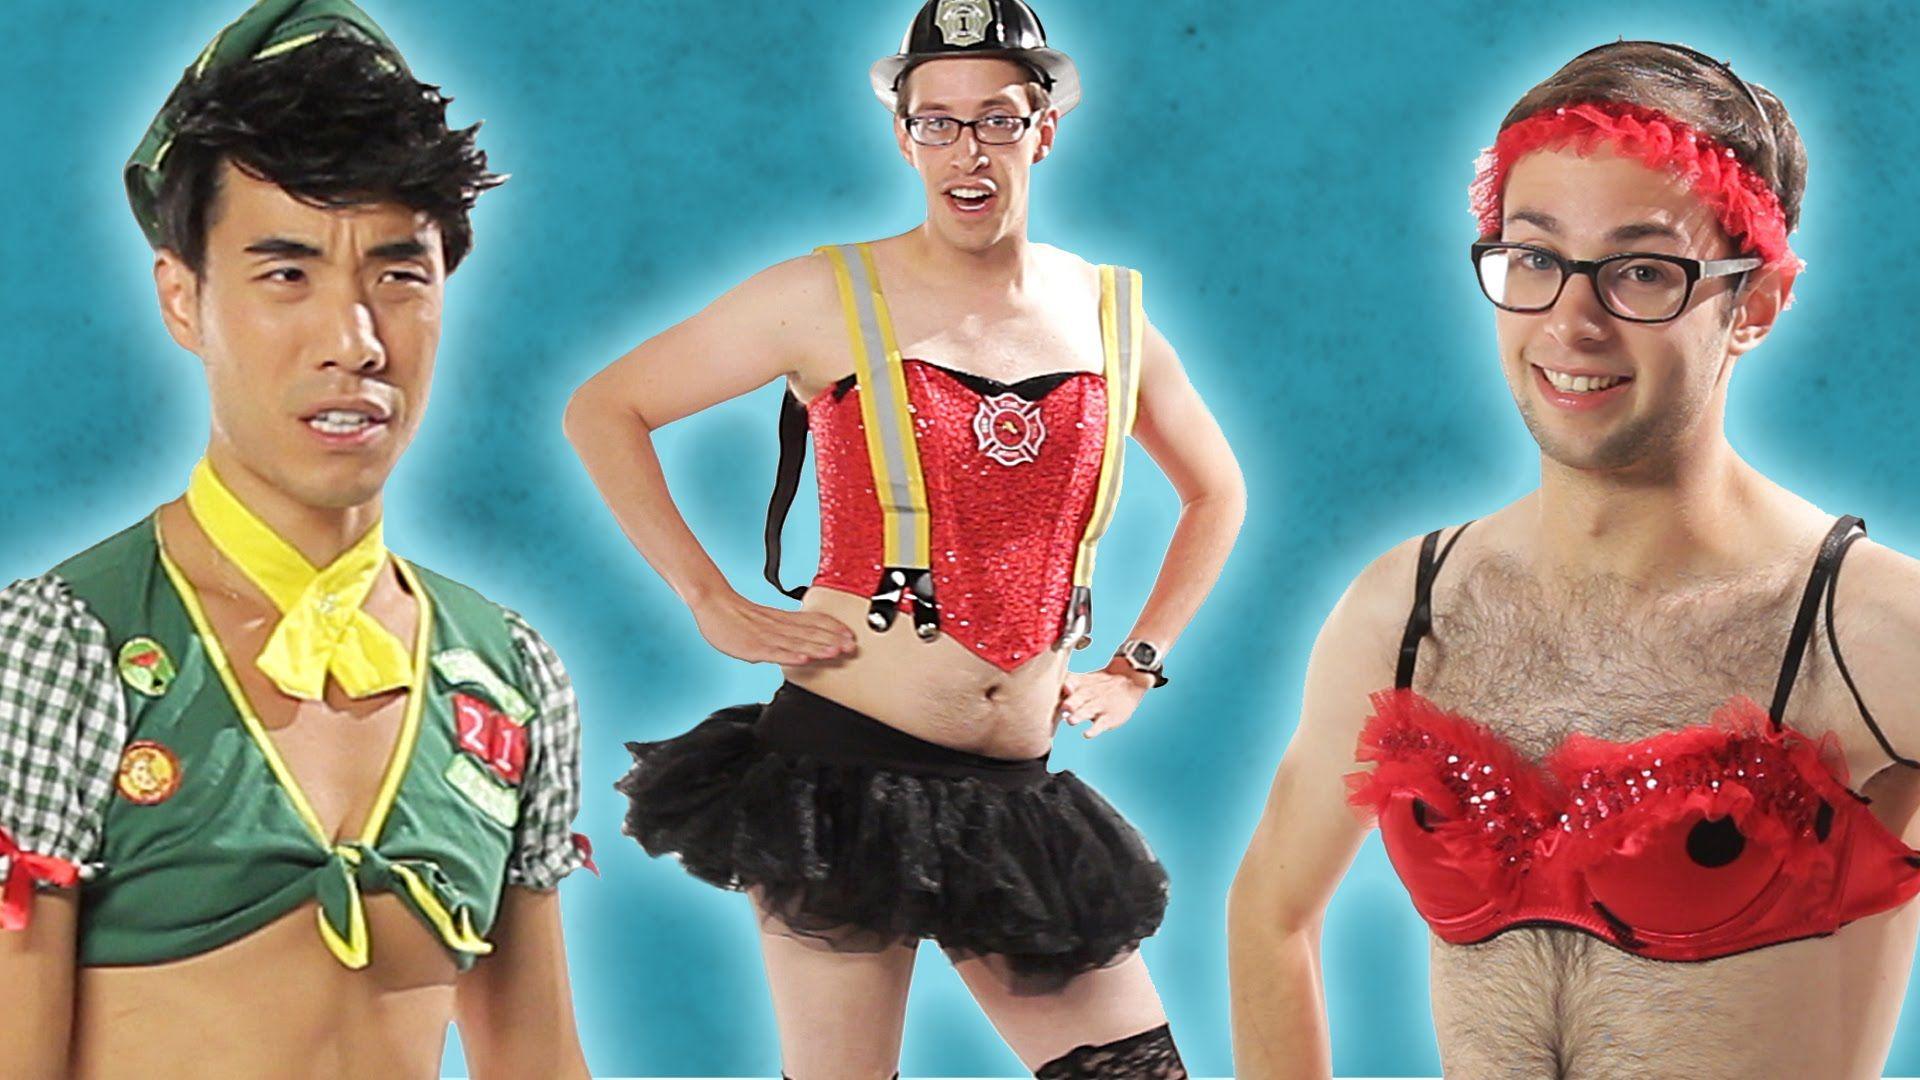 #Men Try On Ladiesu0027 #Sexy #Halloween #Costumes